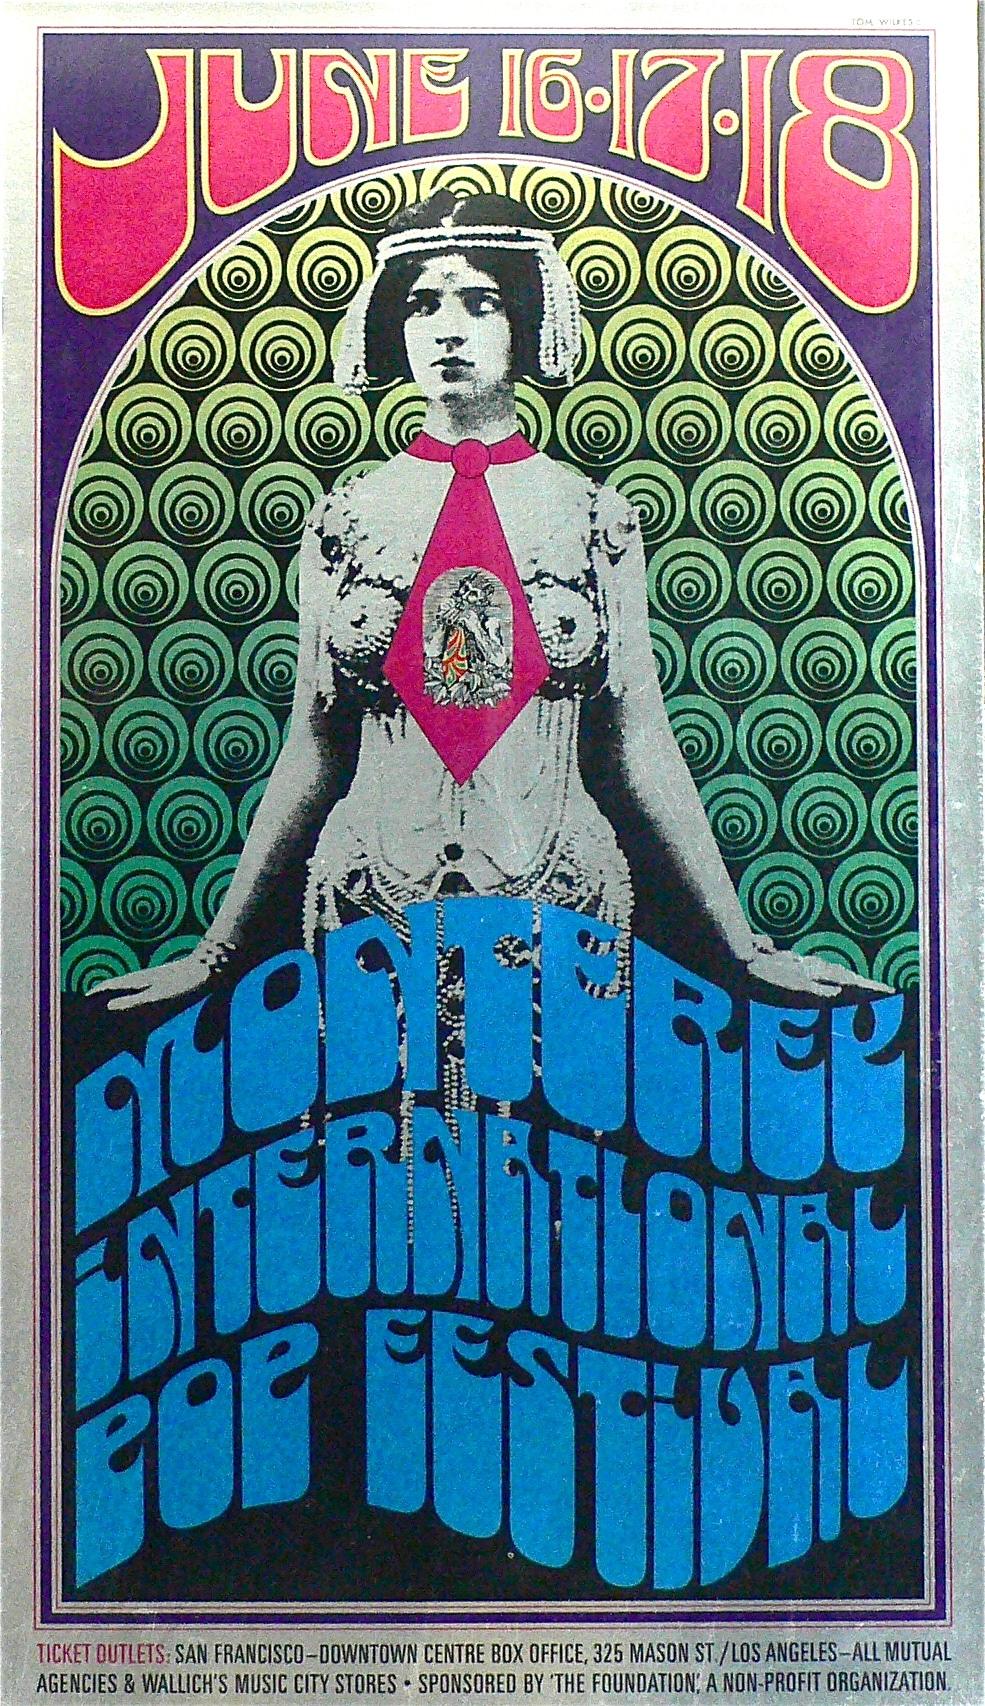 Monterey Pop Festival - 1967